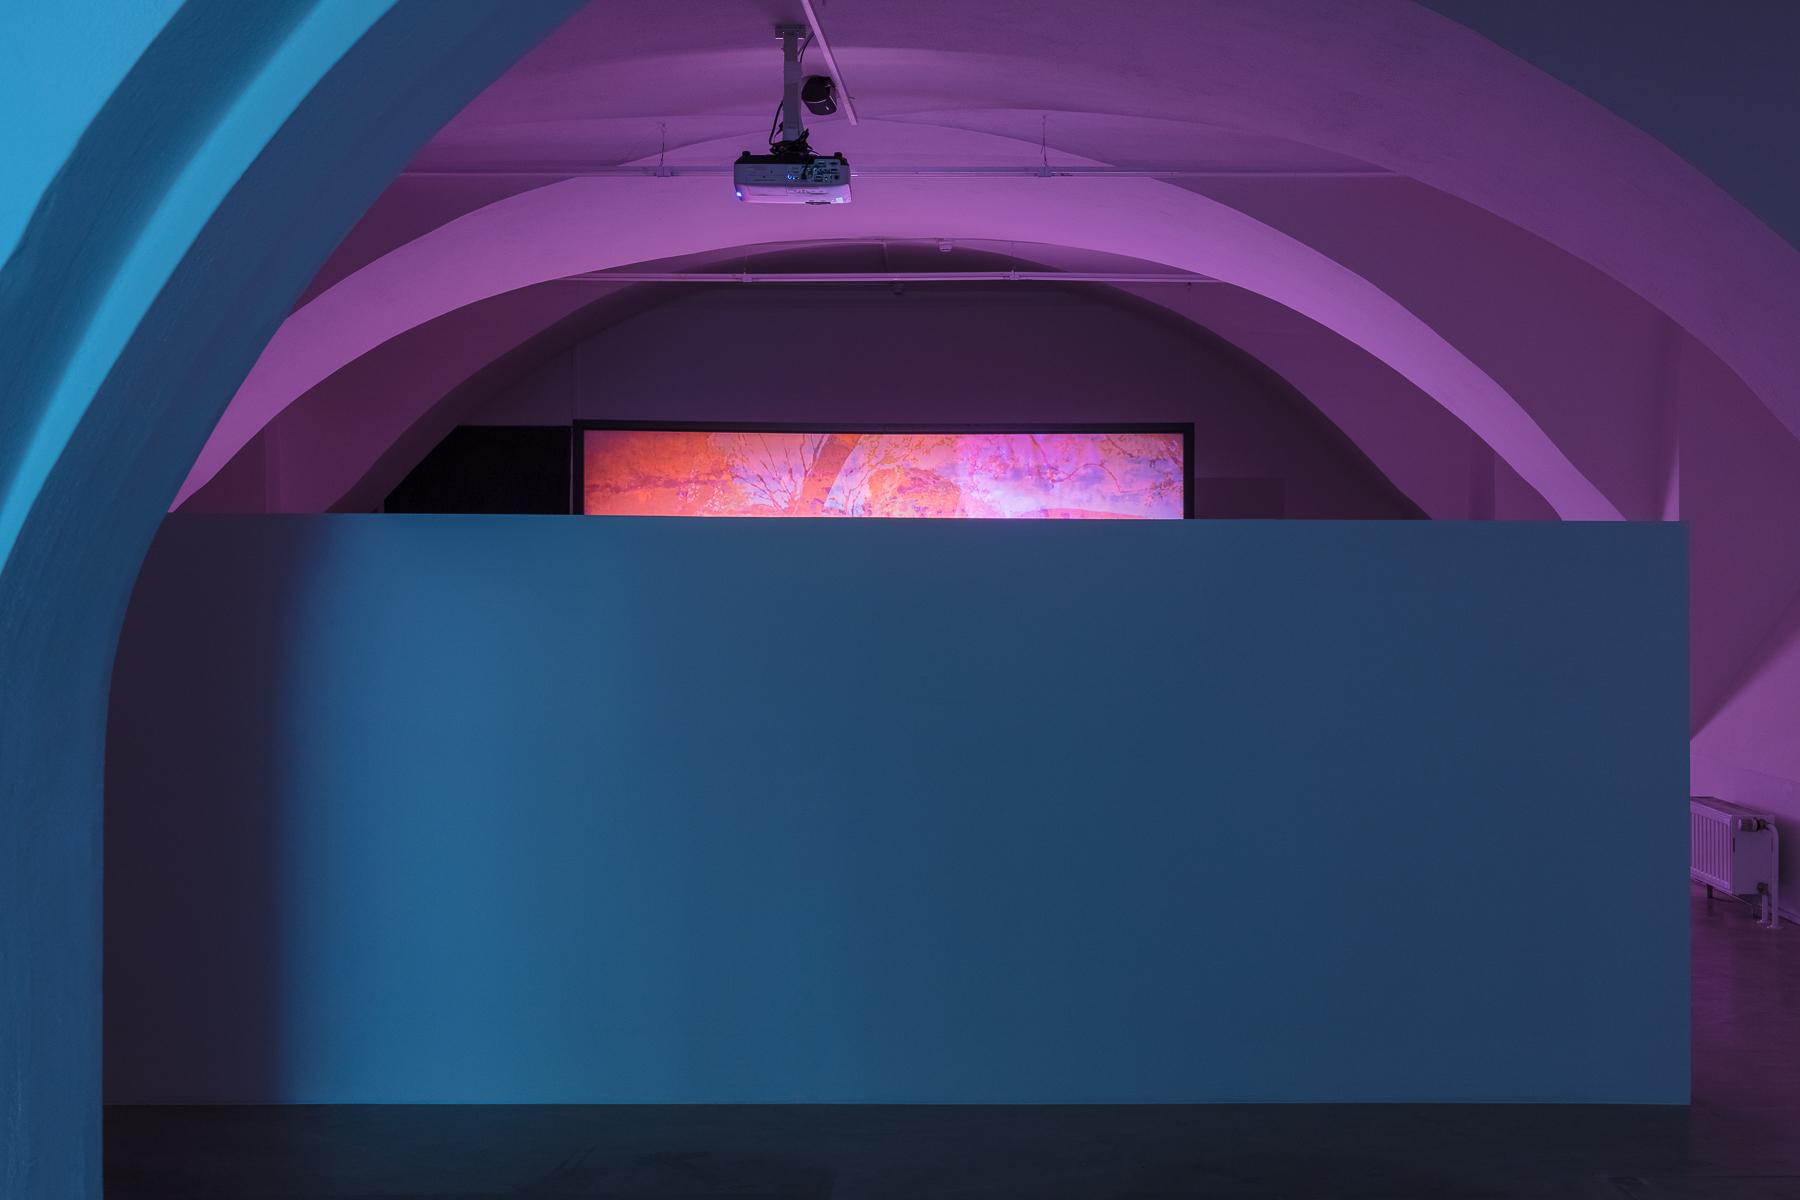 2019_03_11_Grazer Kunstverein_054_web.jpg